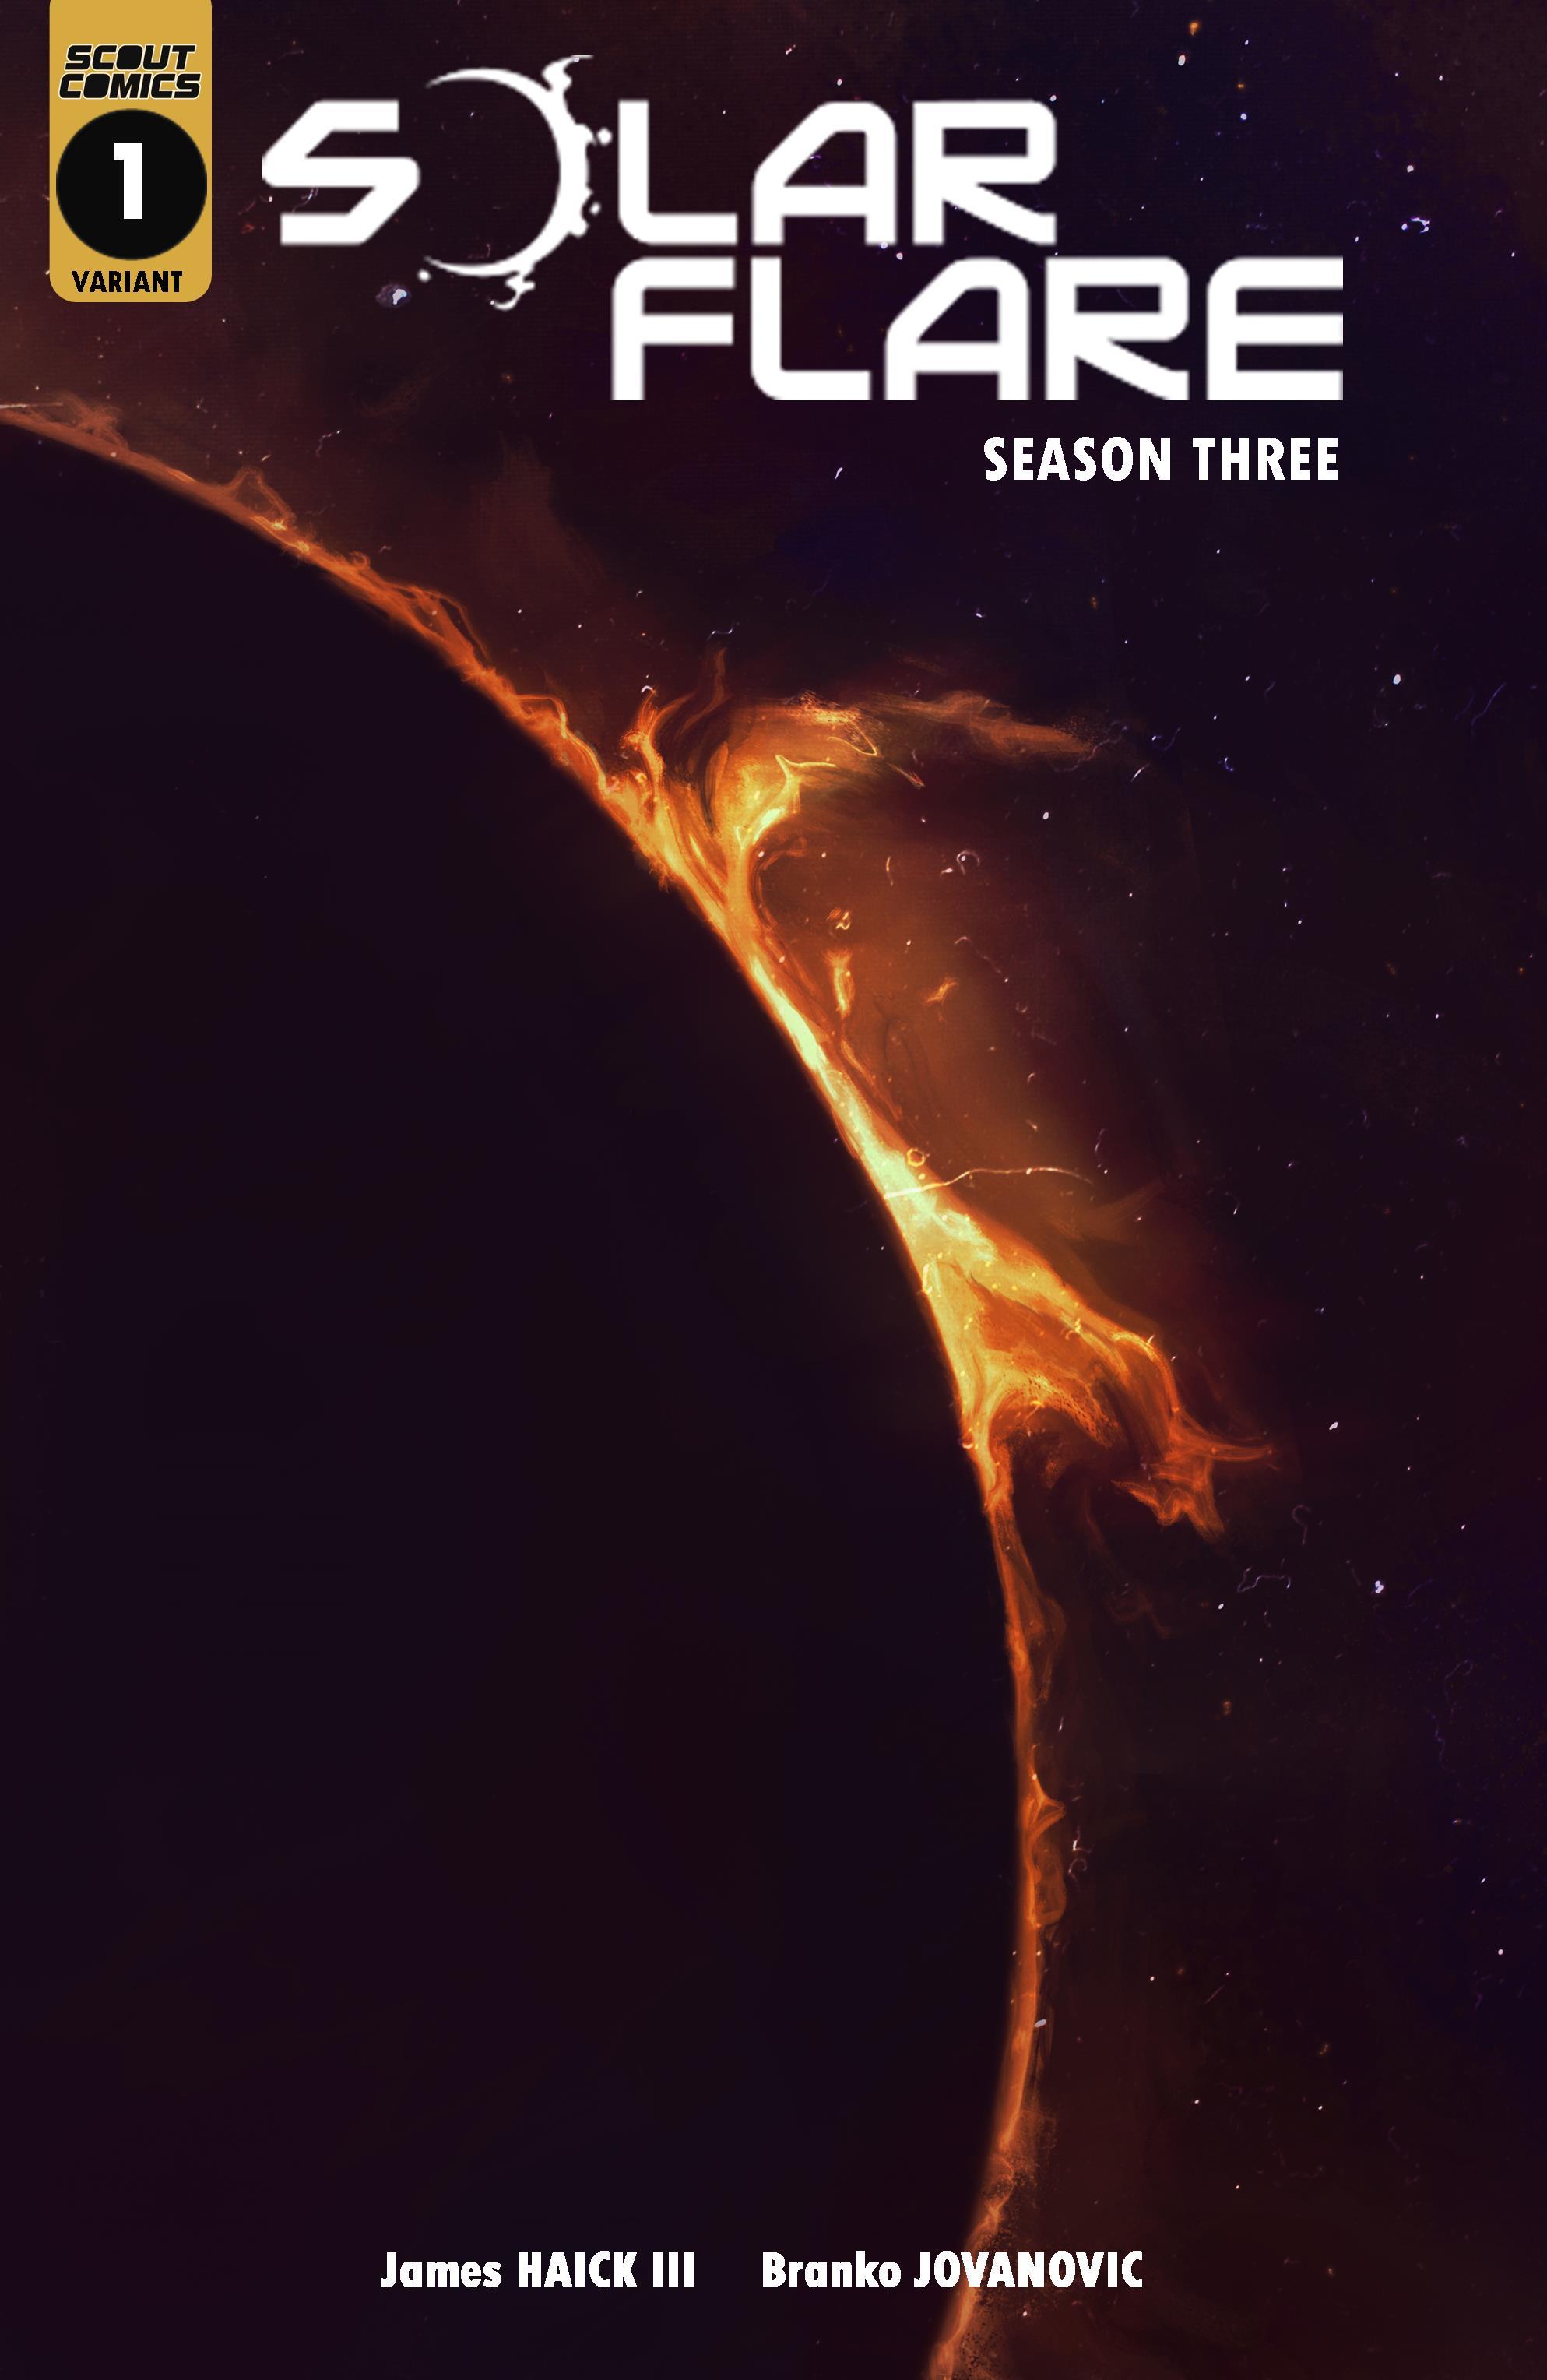 Solar Flare Season Three 1 retailer incentive cover.jpg